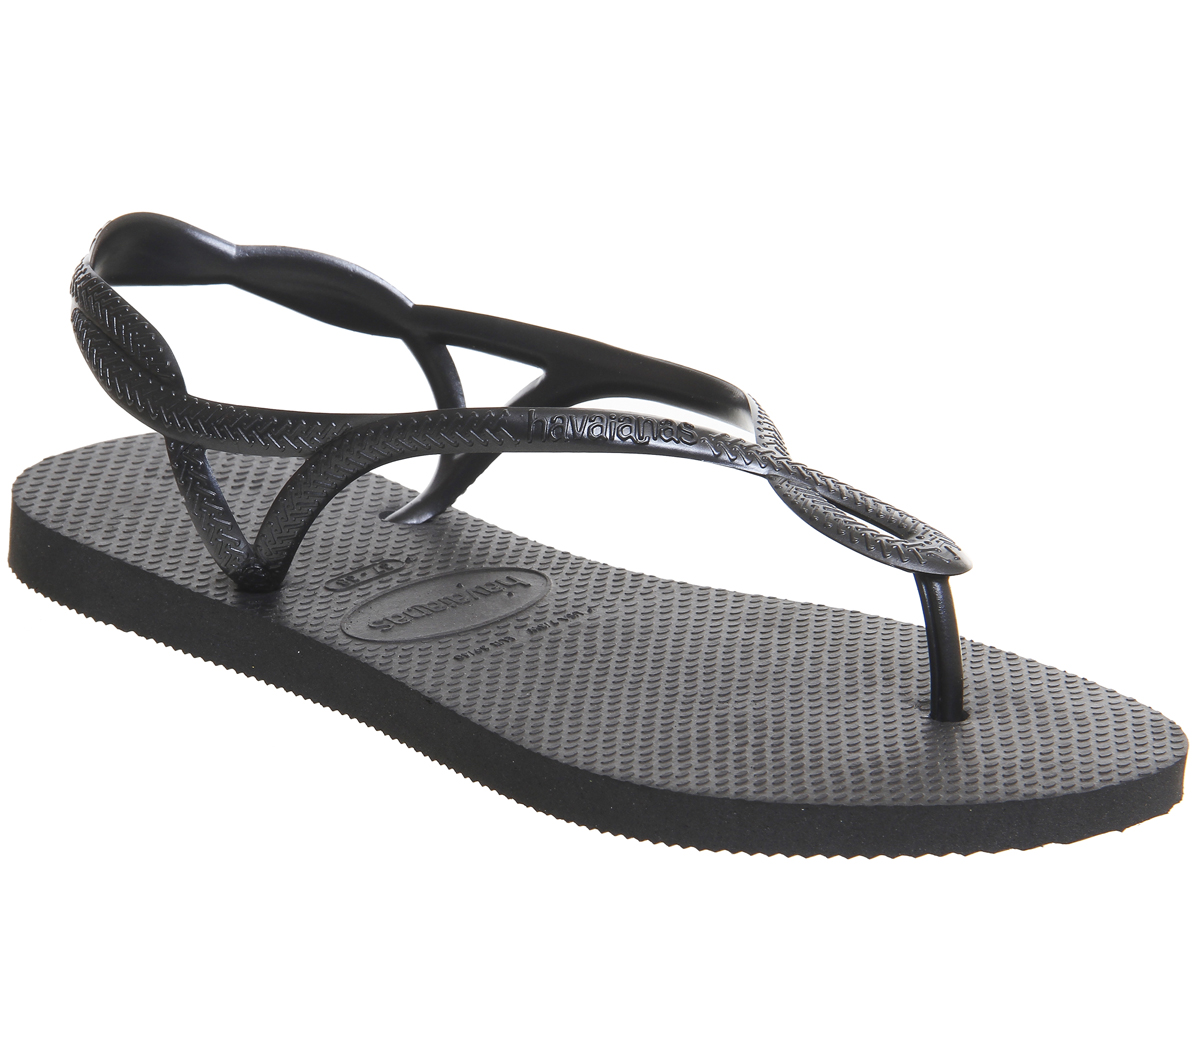 37854ee273 SENTINEL Womens Havaianas Luna infradito sandali neri